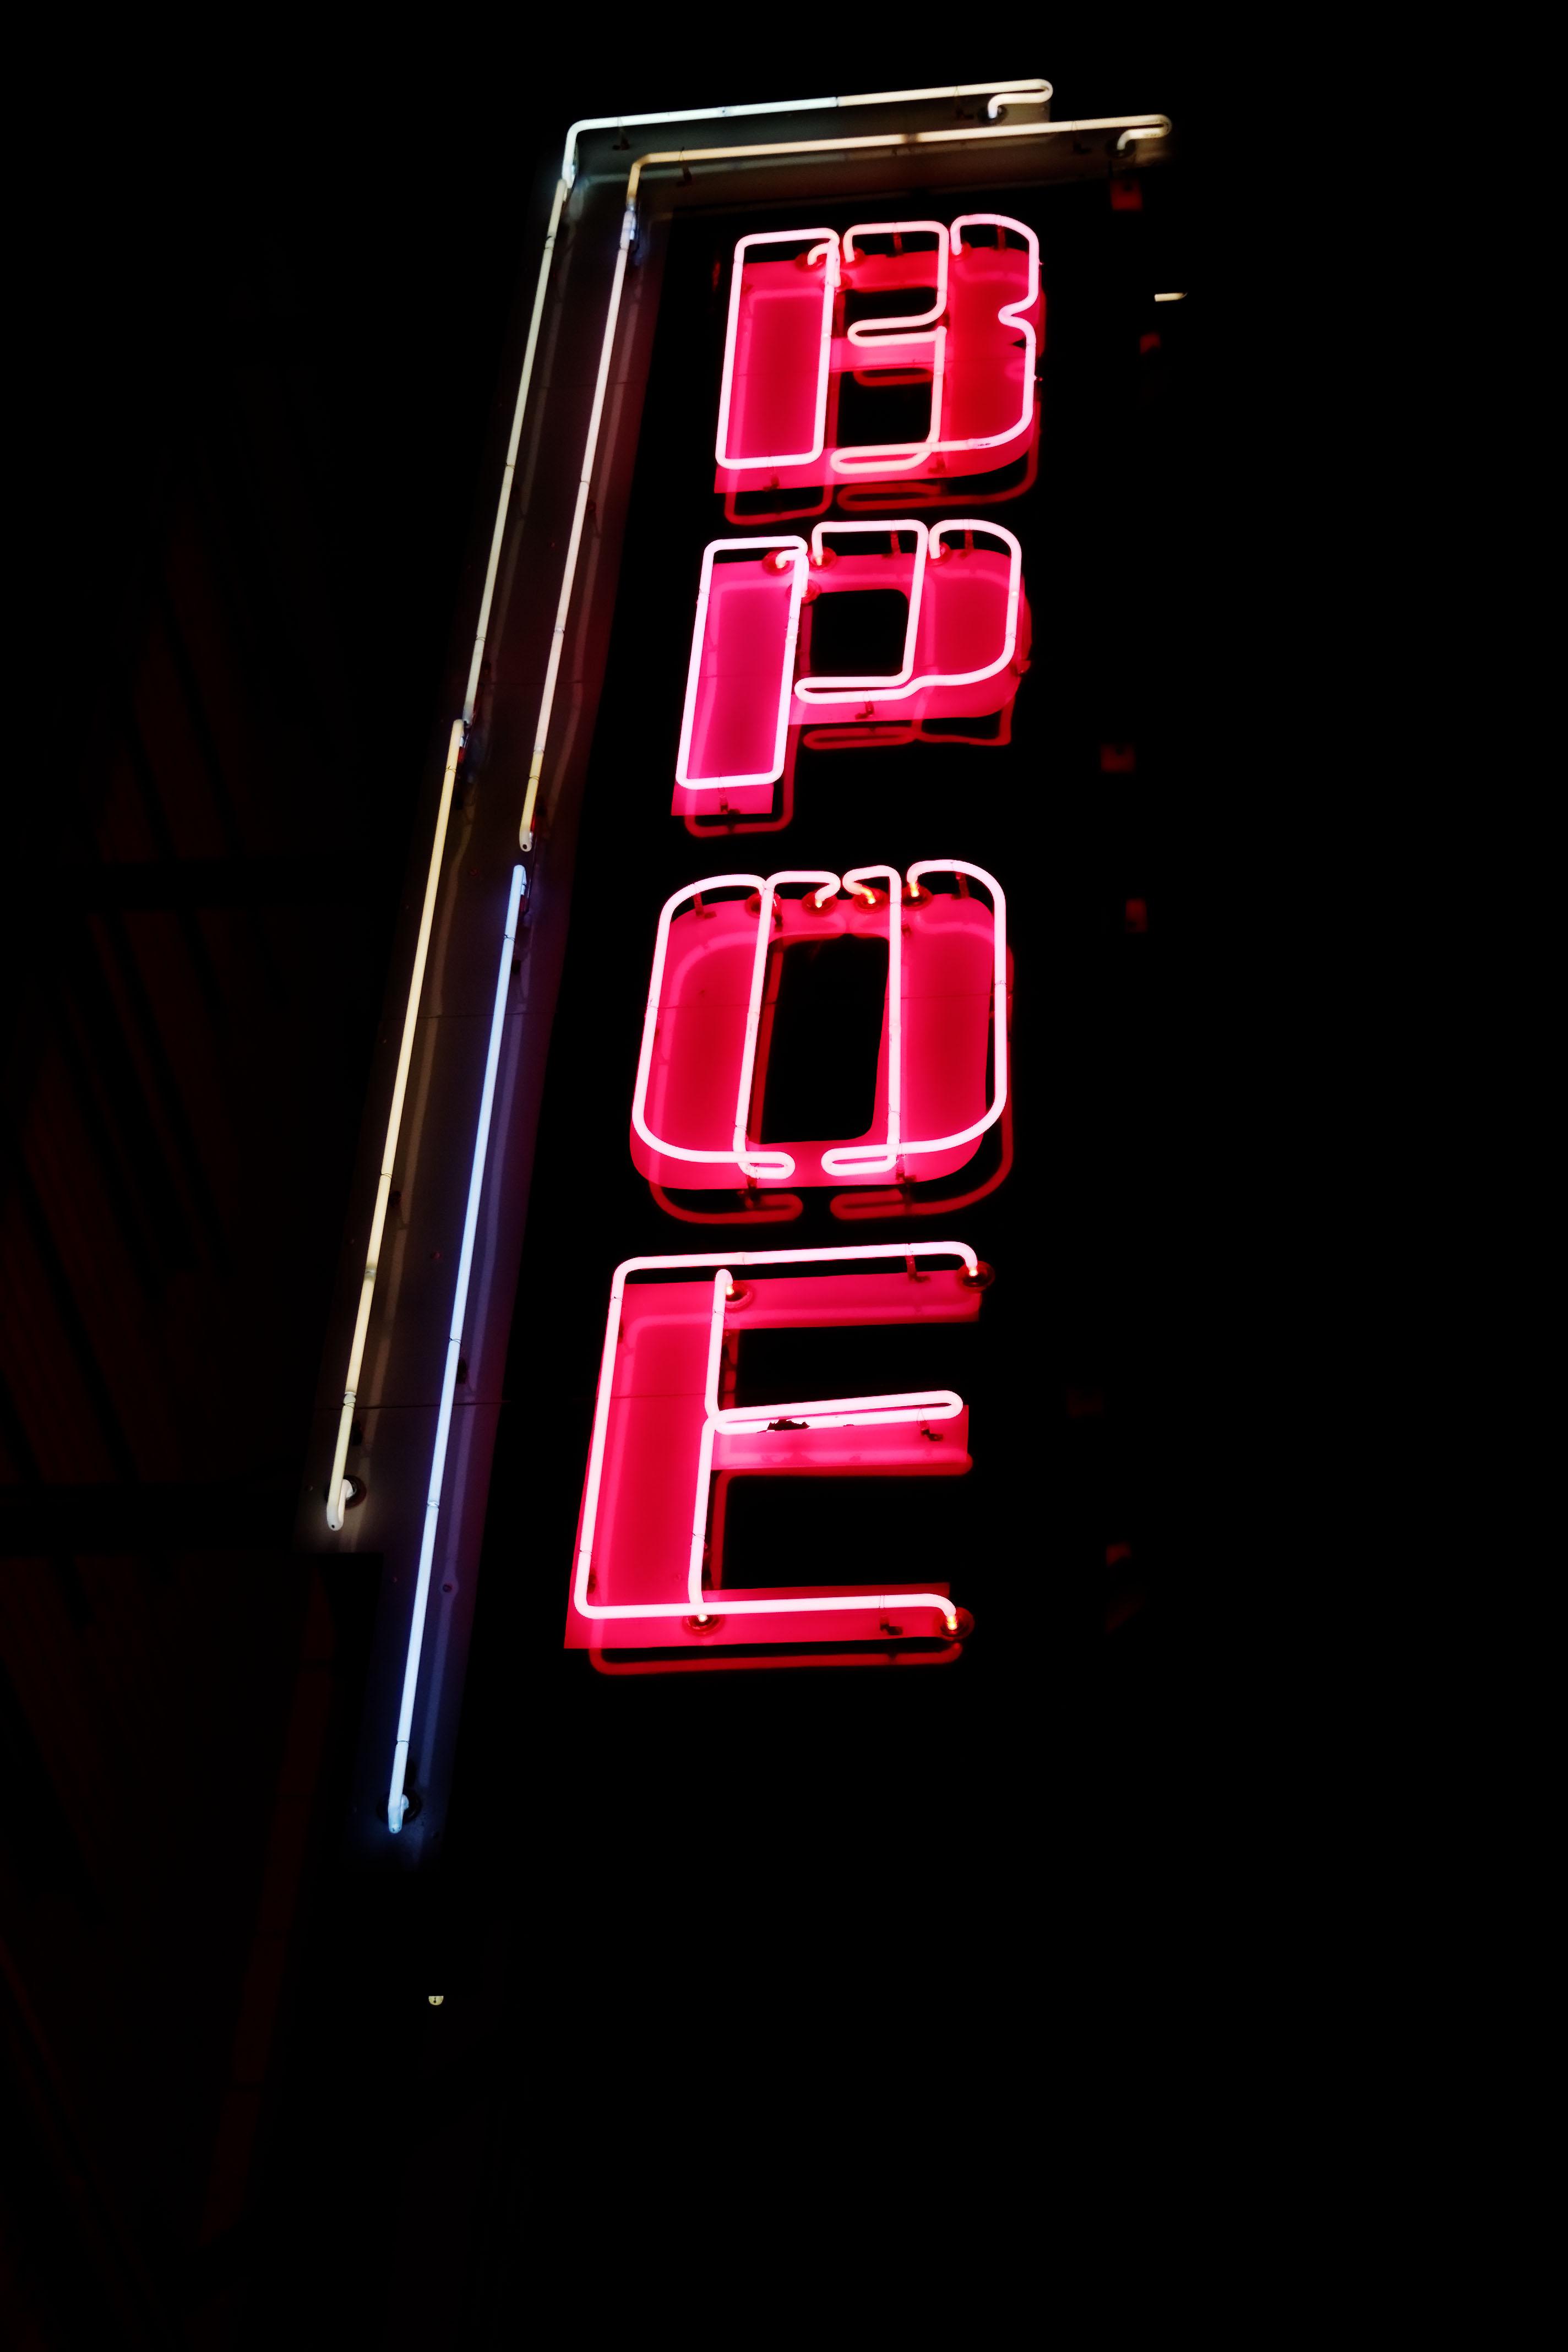 BPOE Neon 3 - 2848 x 4272.jpg